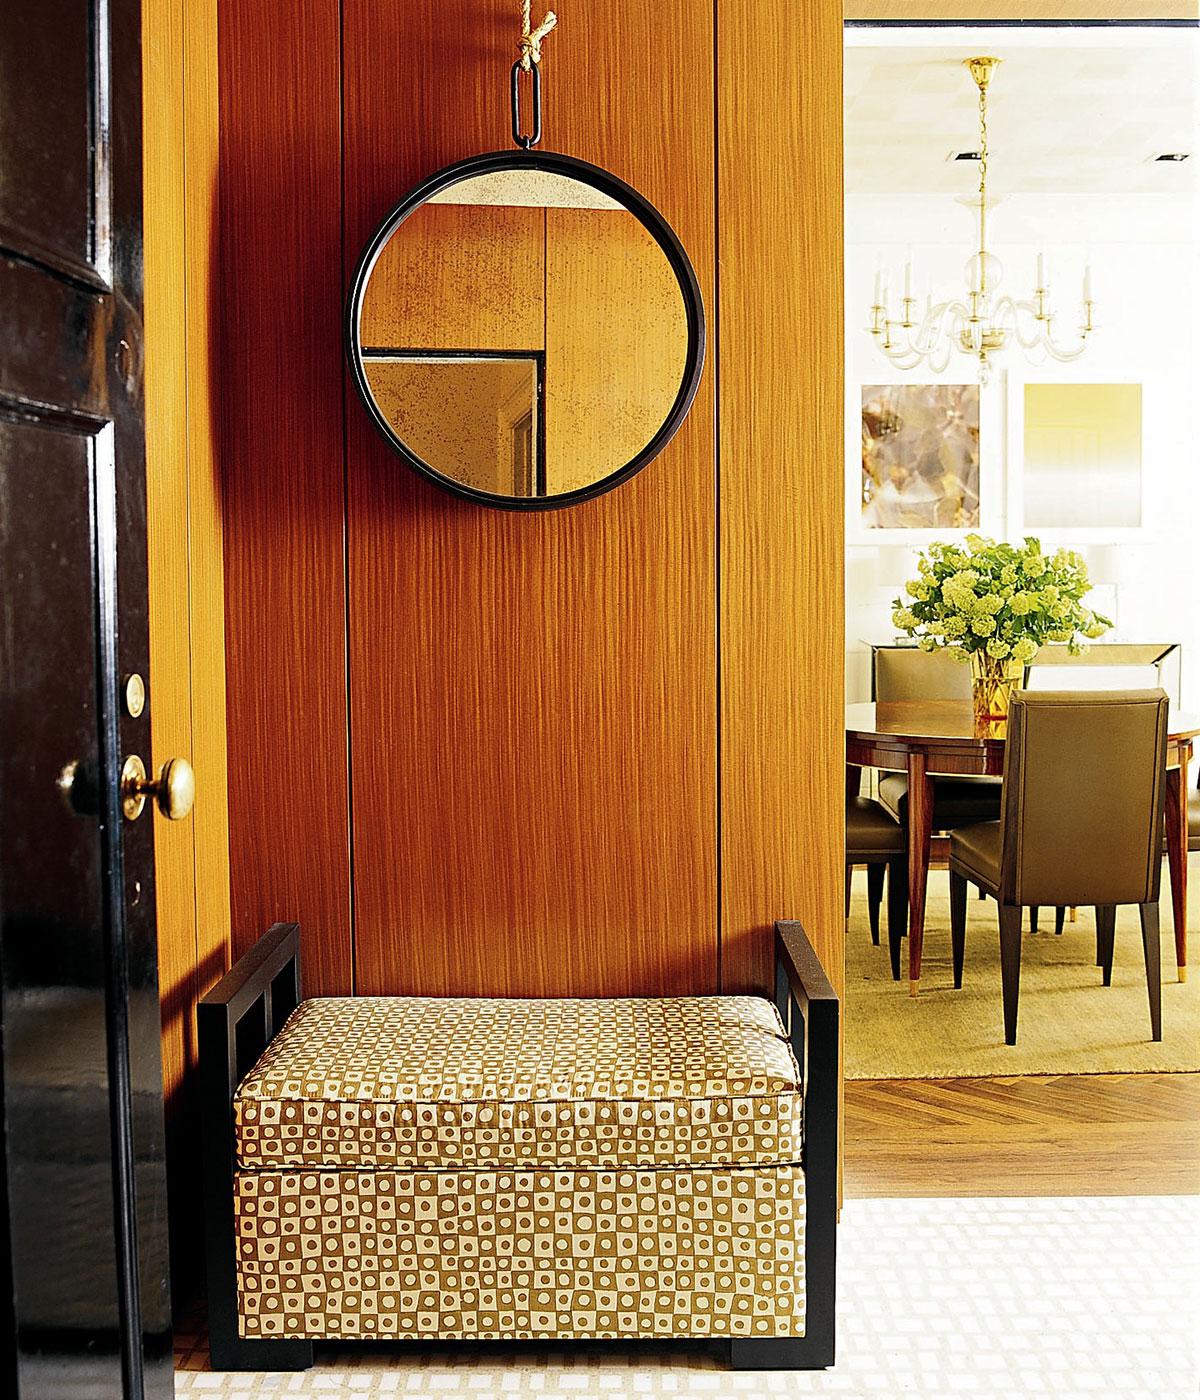 East 67th Street Apartment, New York